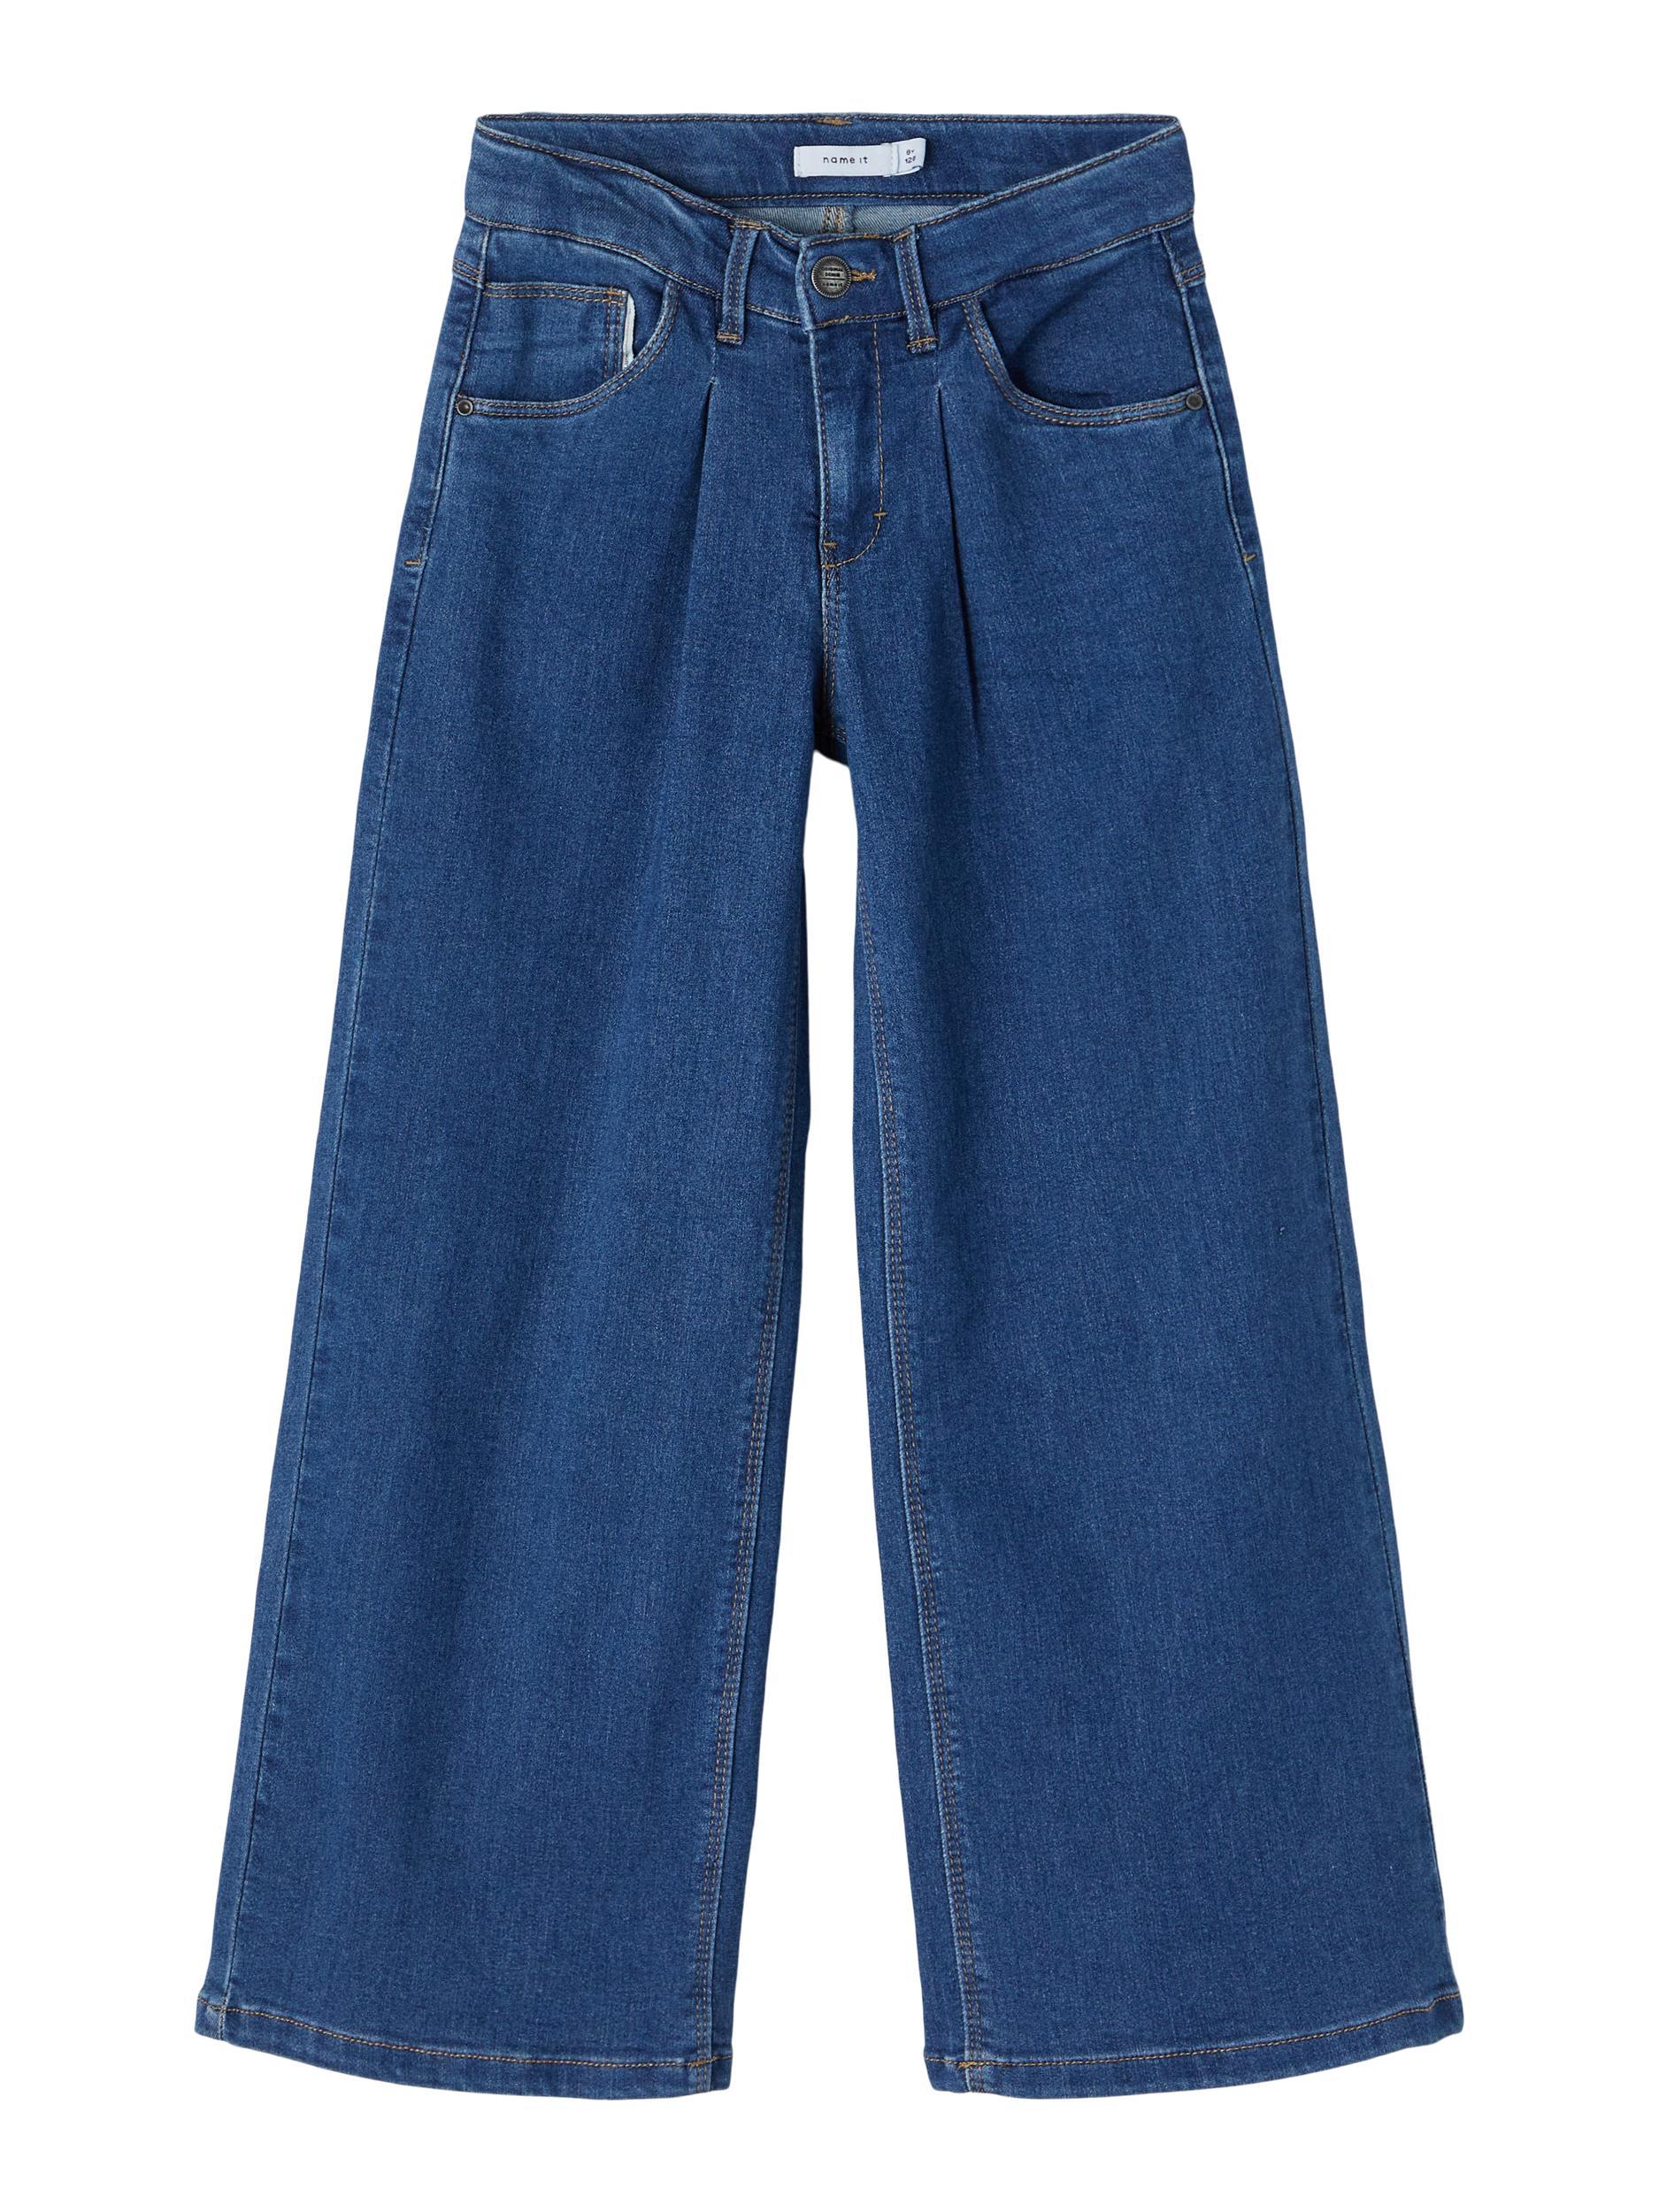 Name It Wide Taspers jeans, medium blue denim, 134